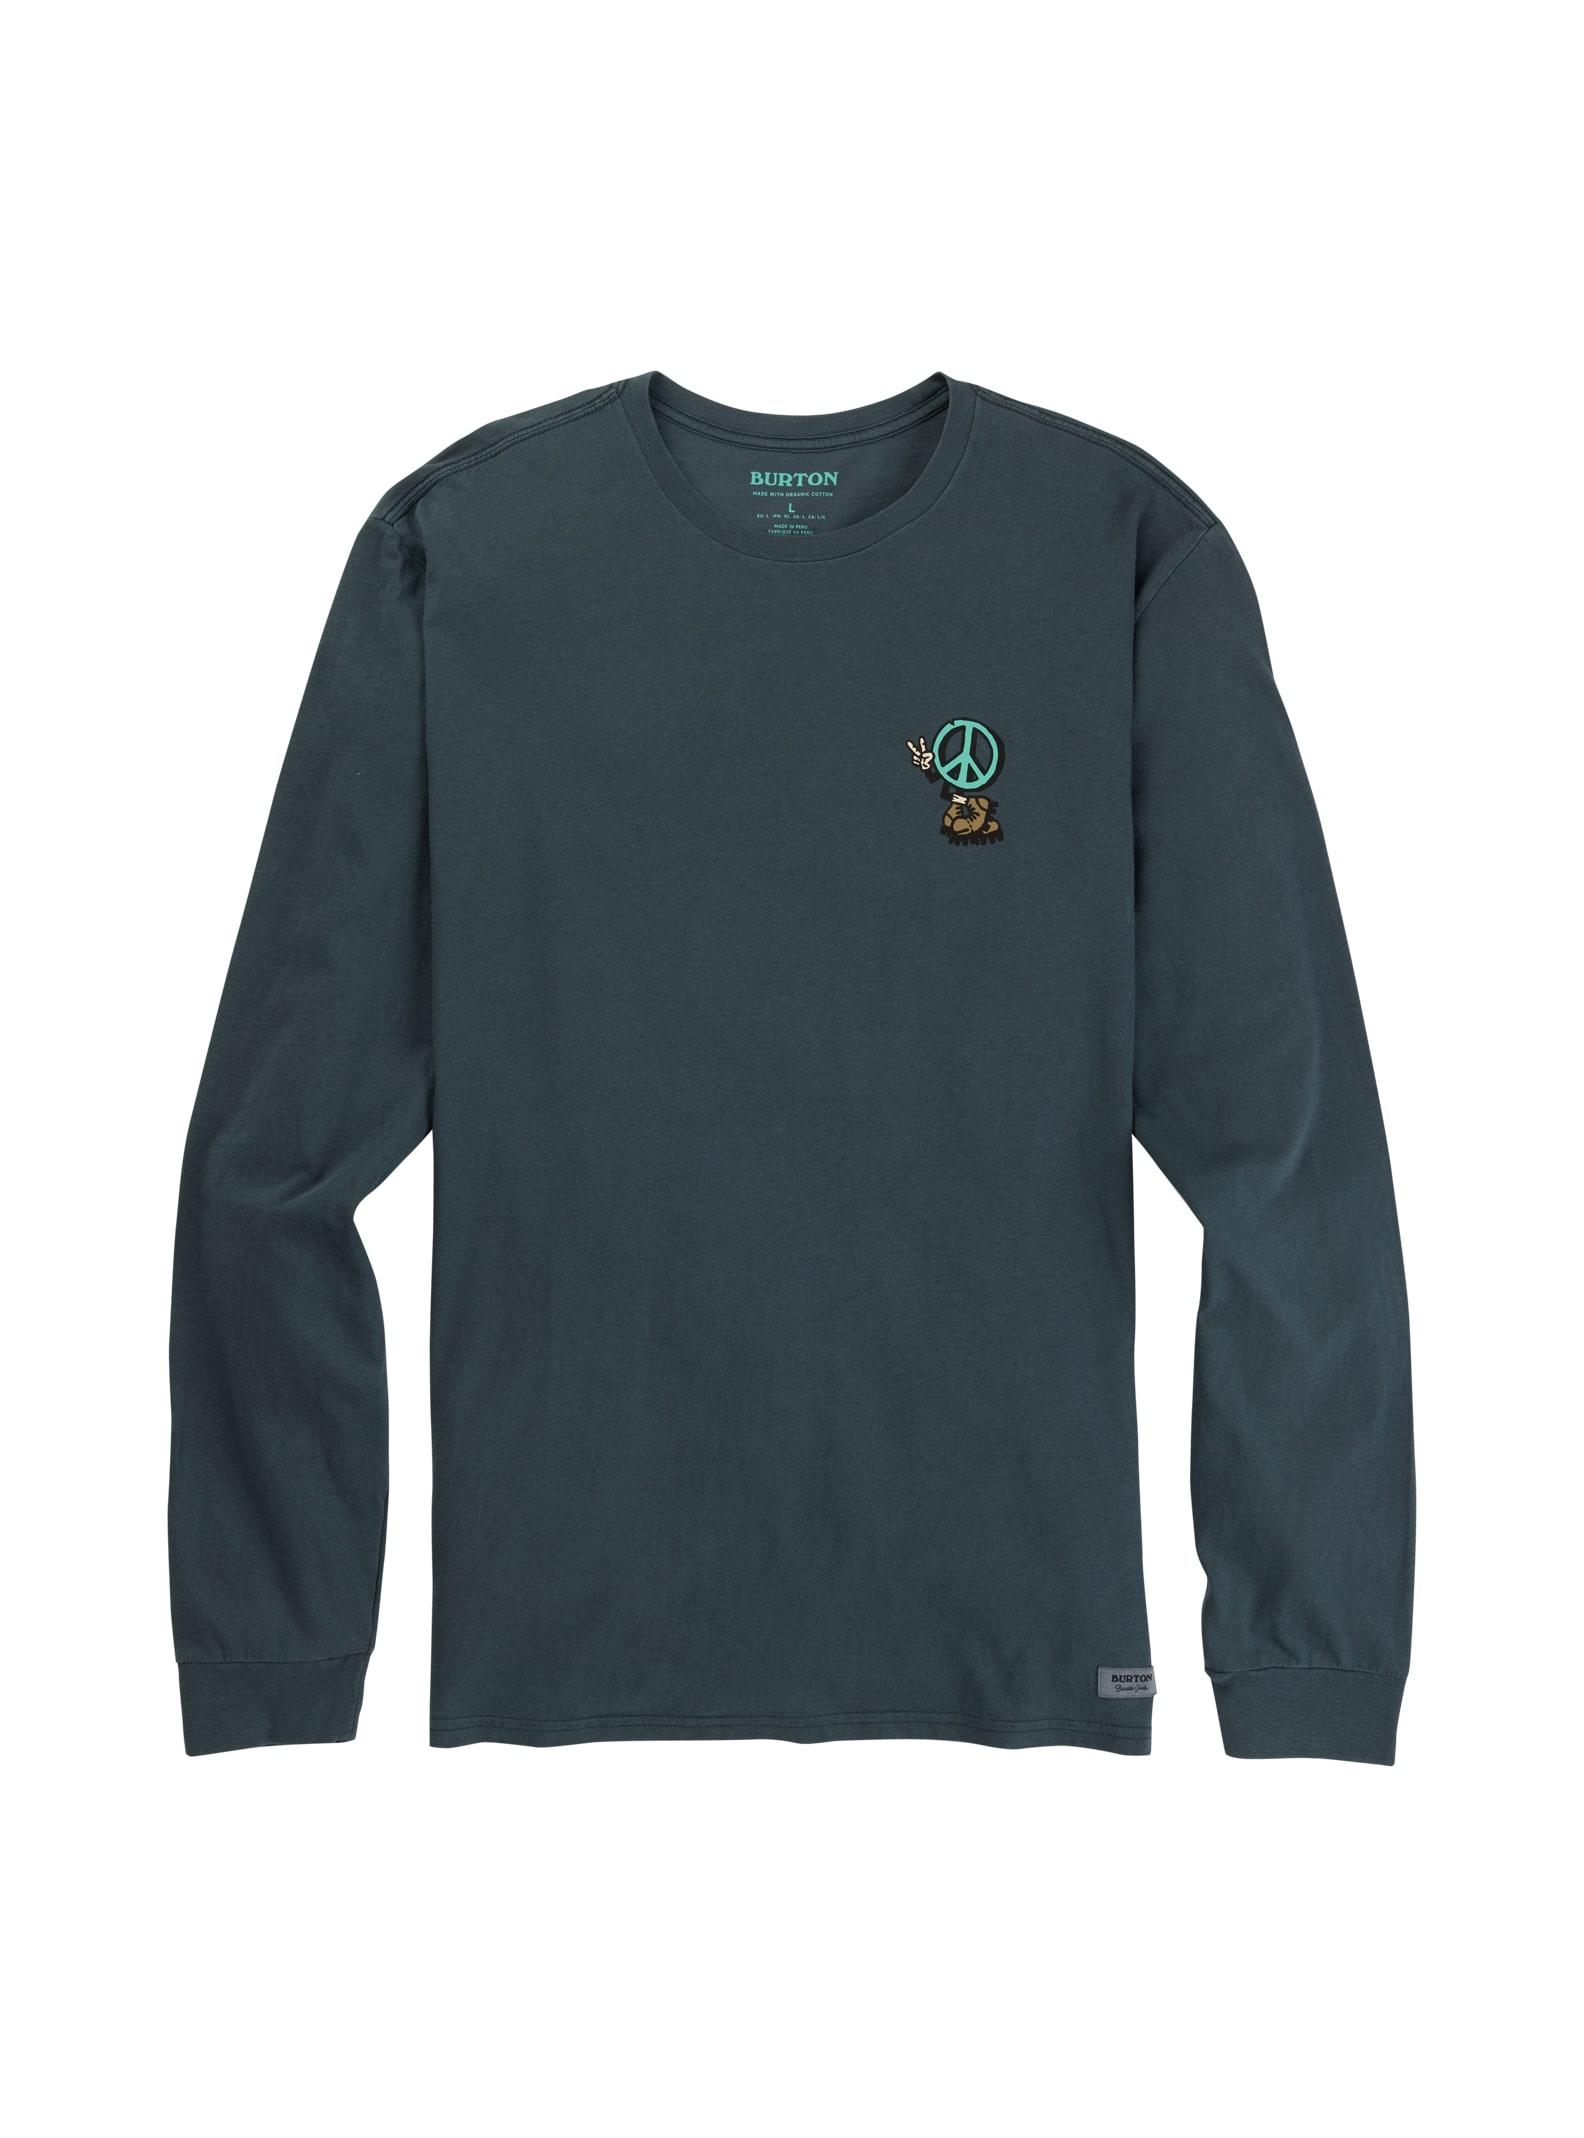 Burton Rigwam långärmad t-shirt för herrar, M